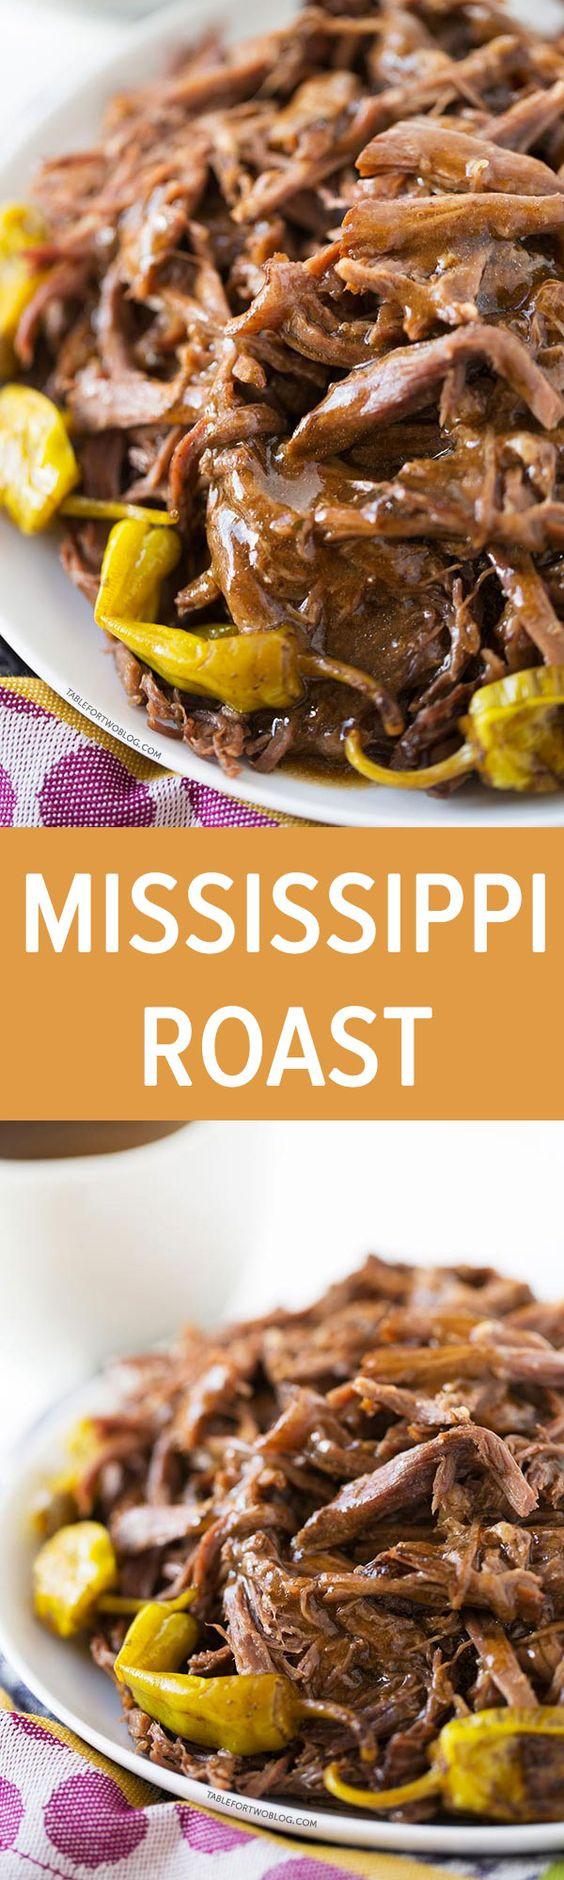 Pepperchini Roast Crock Pot Keto  The 50 Best Crock Pot Recipes Pinned the Most on